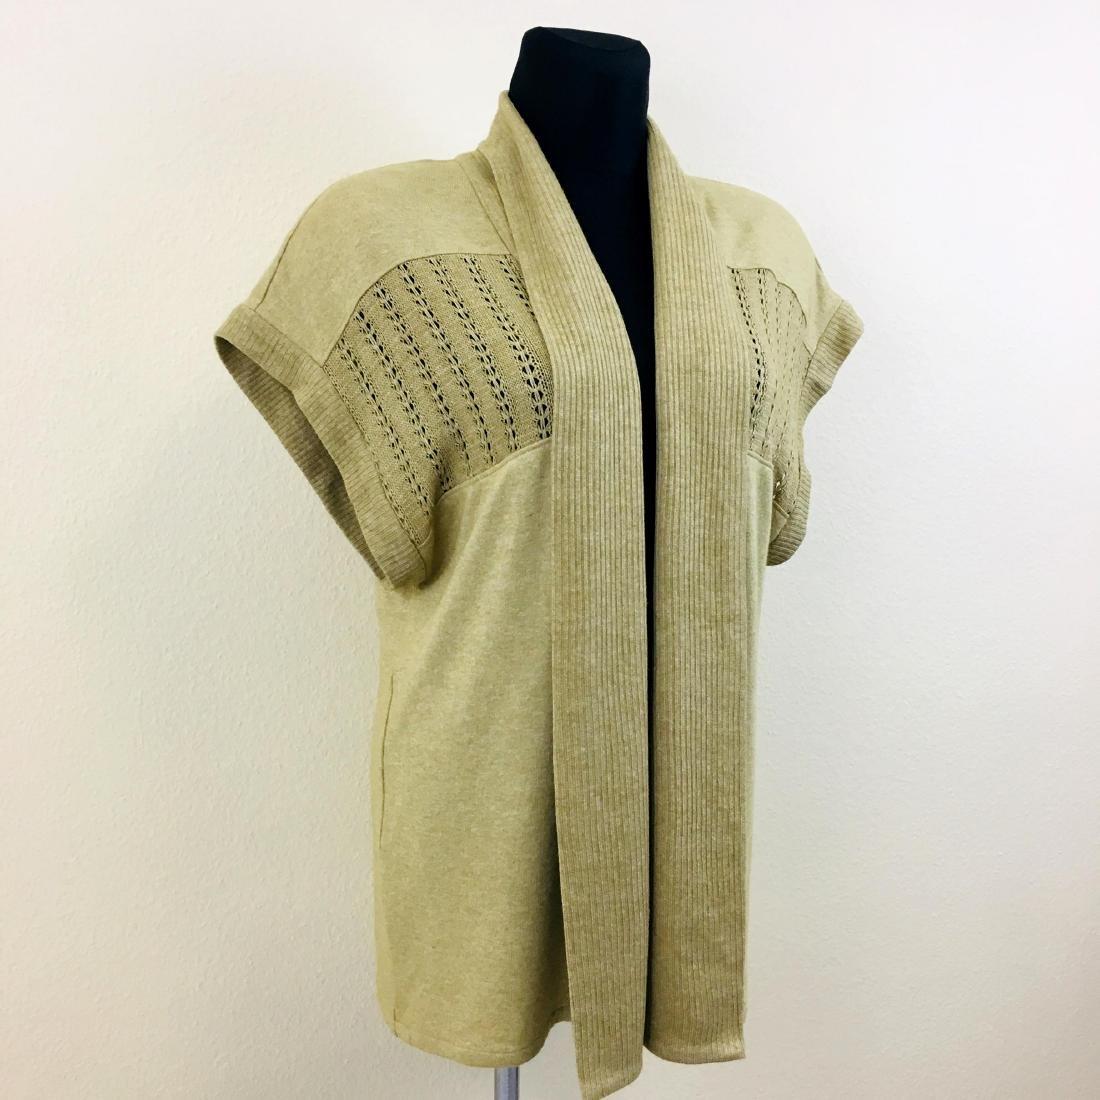 Women's Creation Charmante Wool Blend Cardigan Sweater - 2